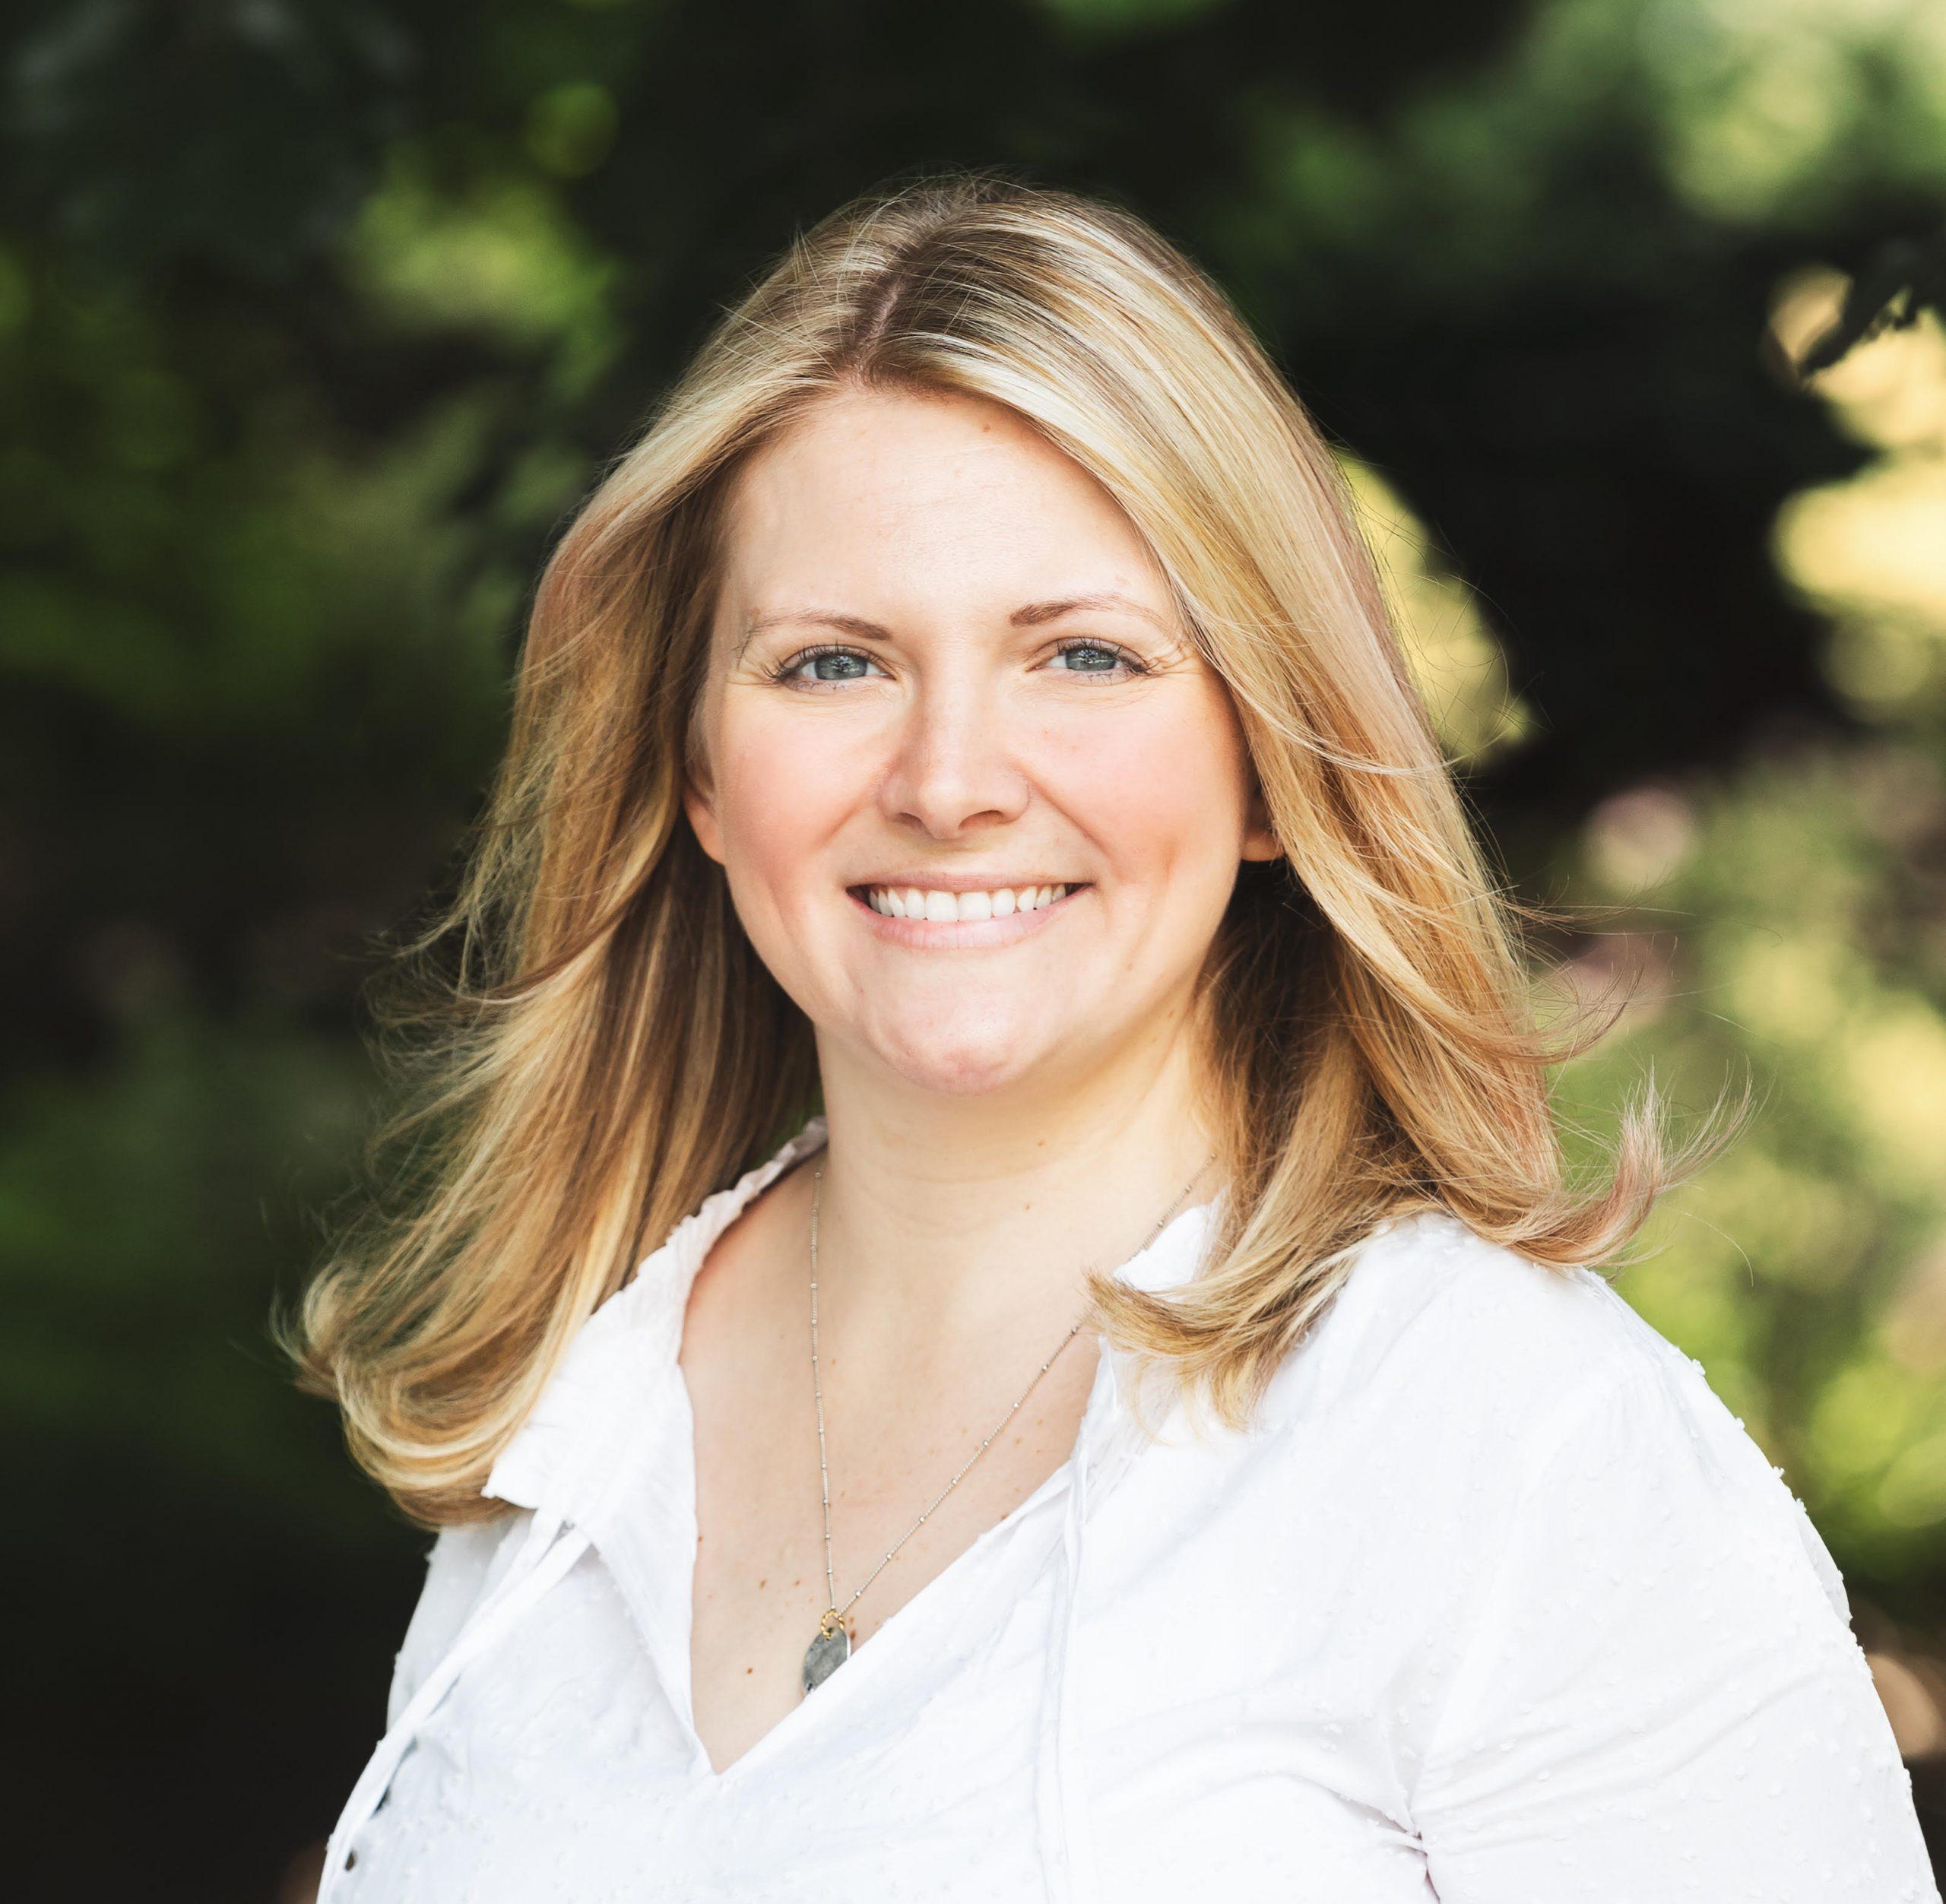 Christina Garlewicz - Midwife Assistant